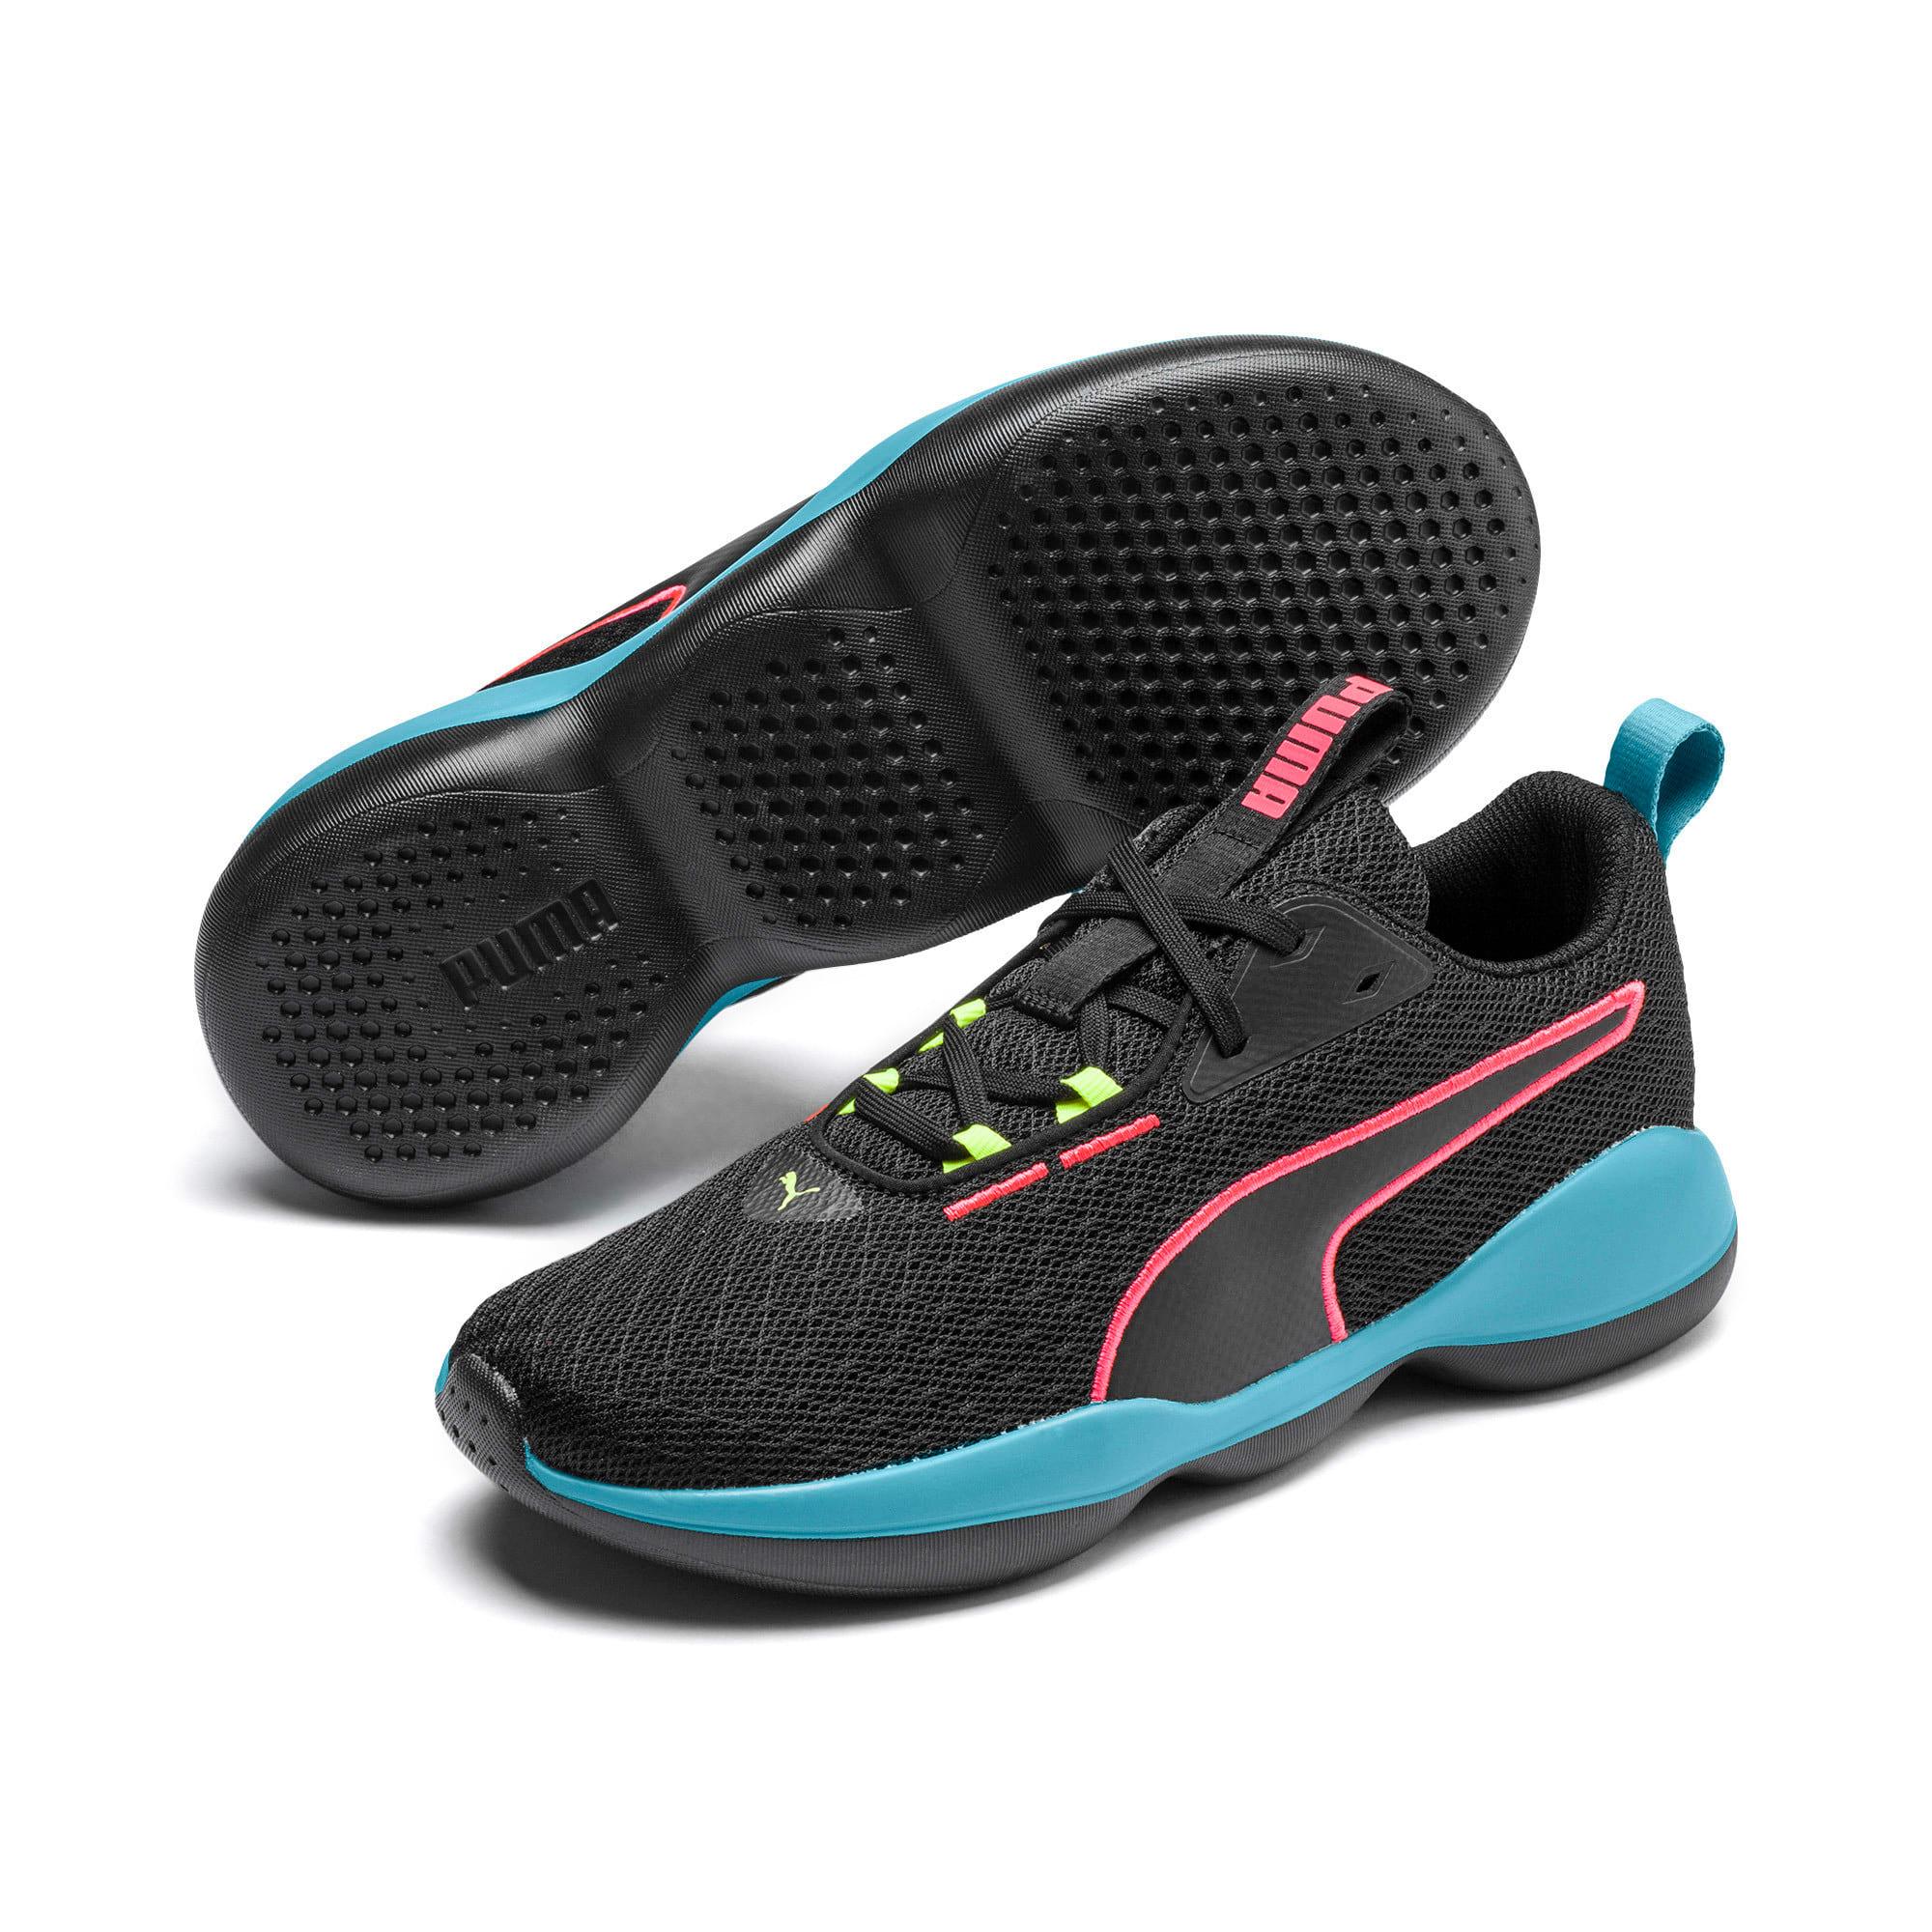 Thumbnail 2 of Flourish FS Women's Training Shoes, Puma Black-Milky Blue, medium